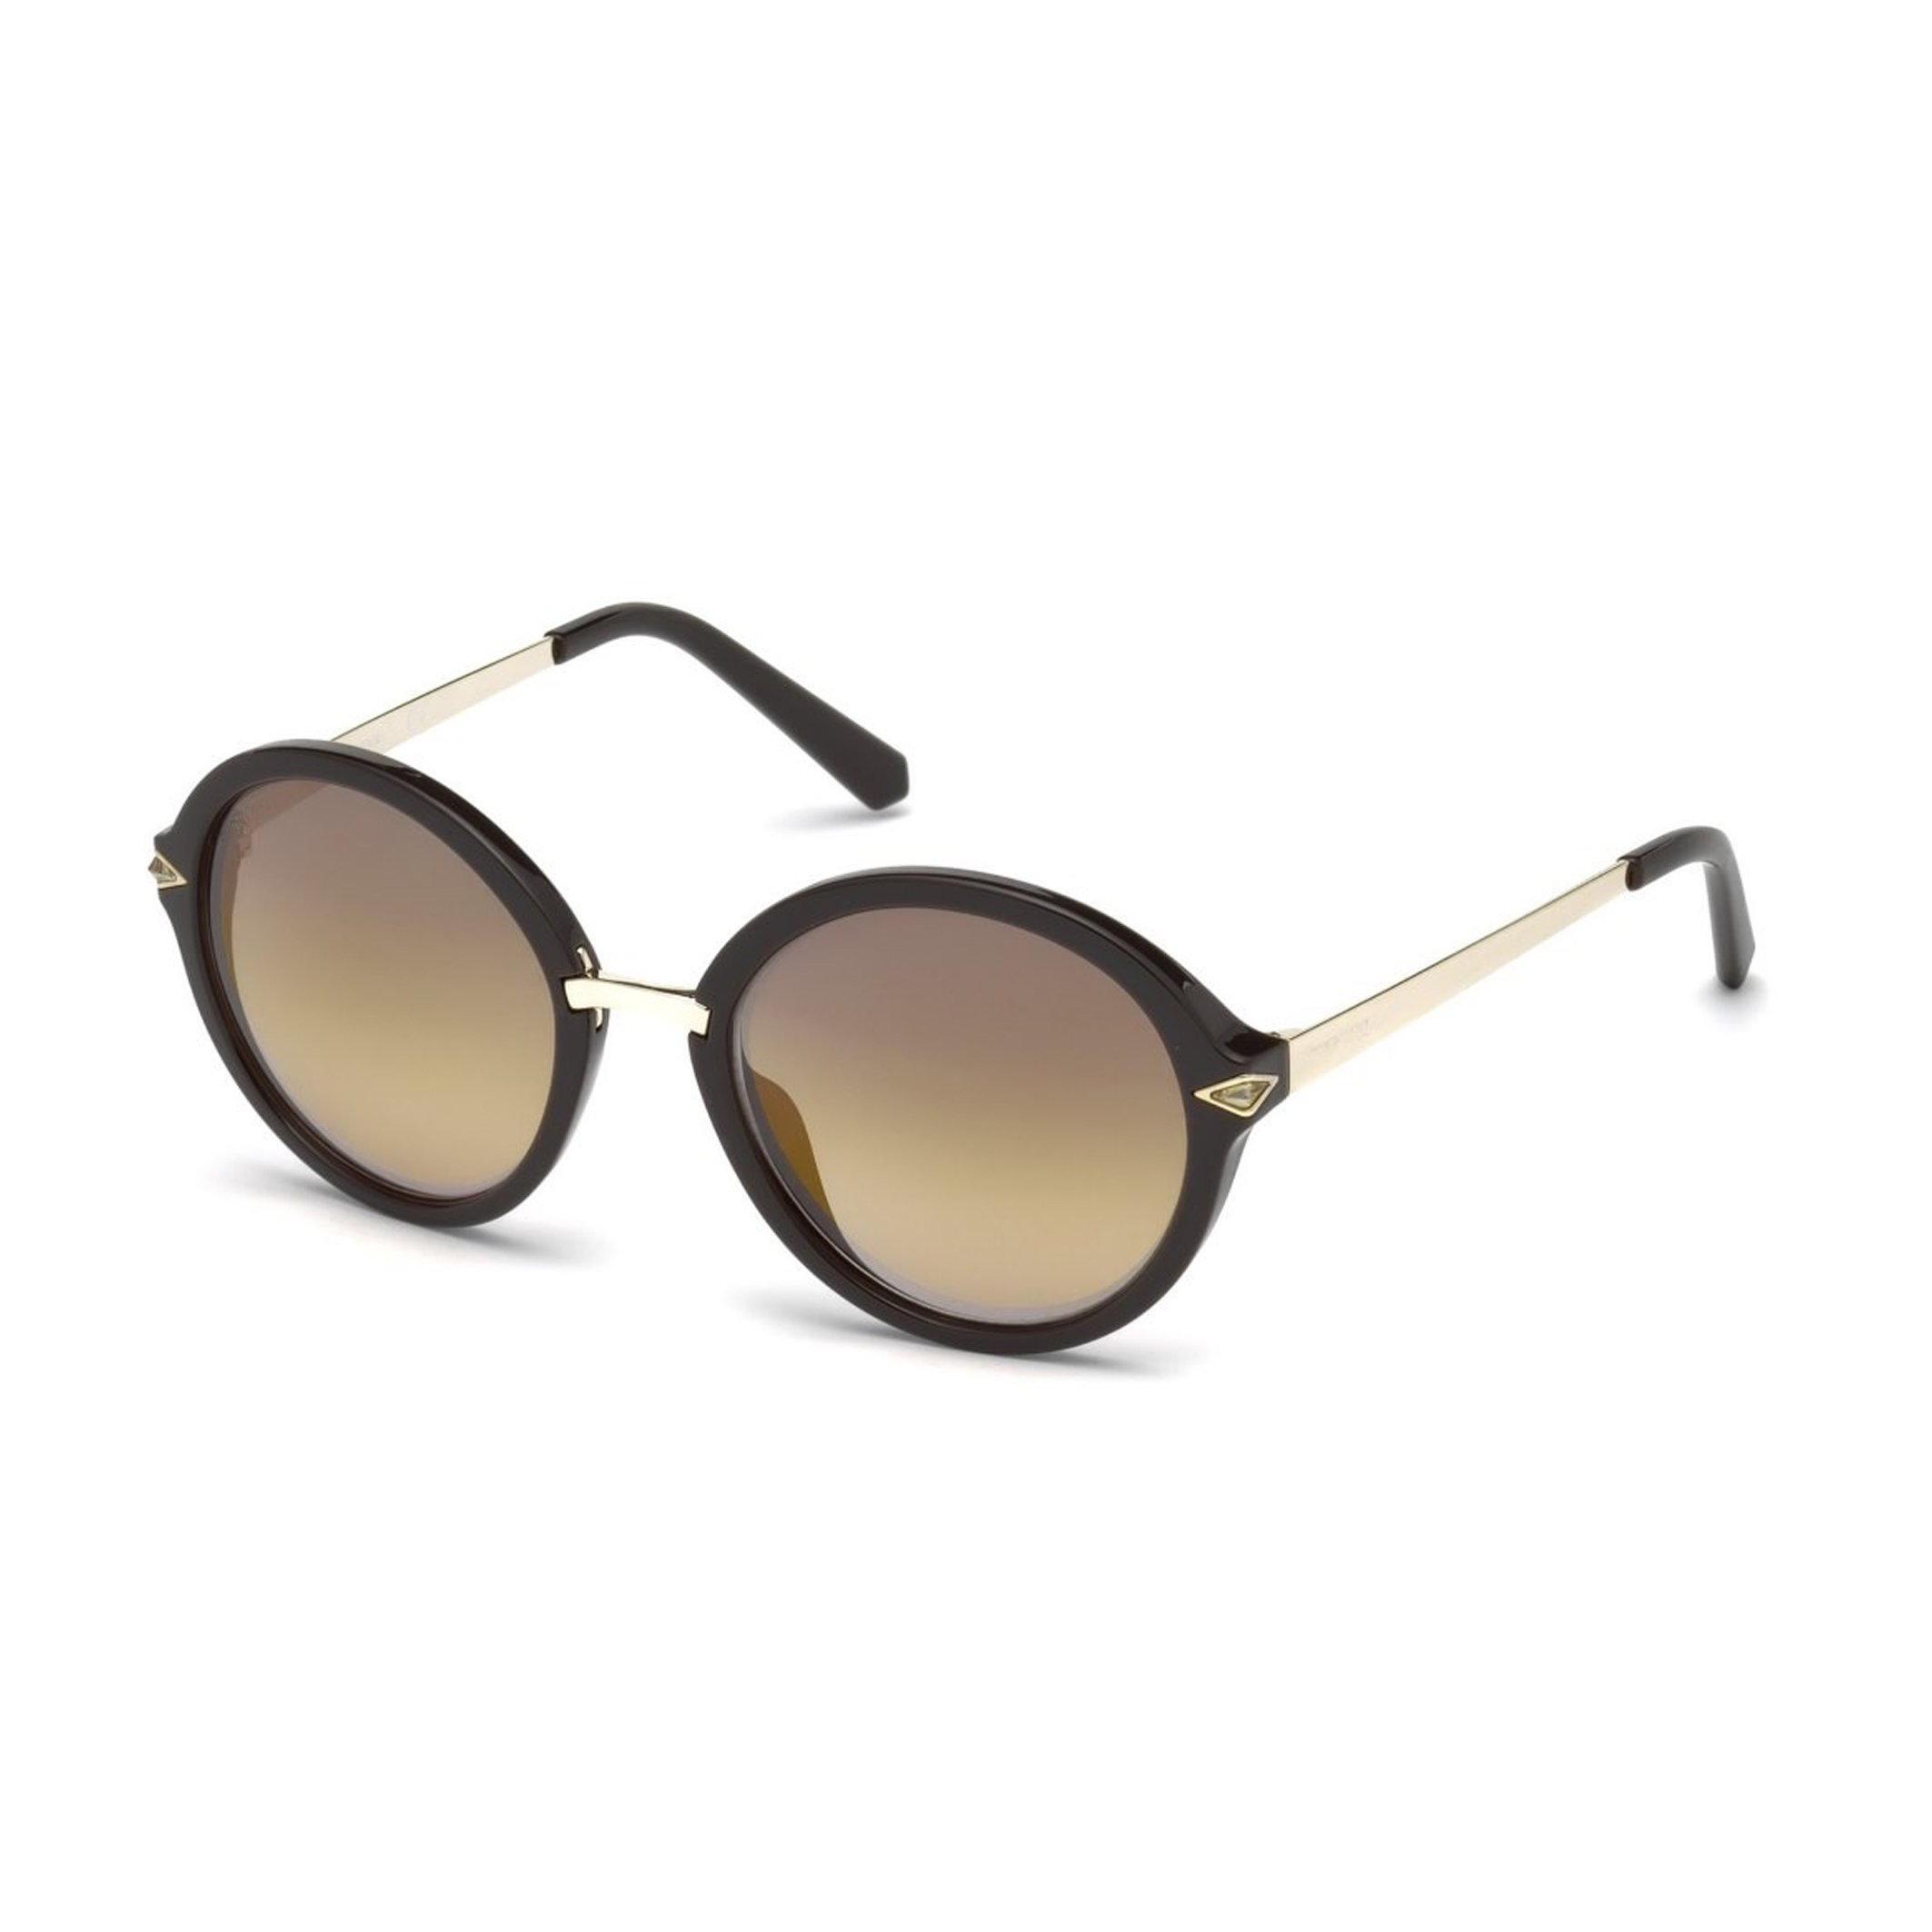 Swarovski Women's Sunglasses Black SK0153 - black-1 NOSIZE